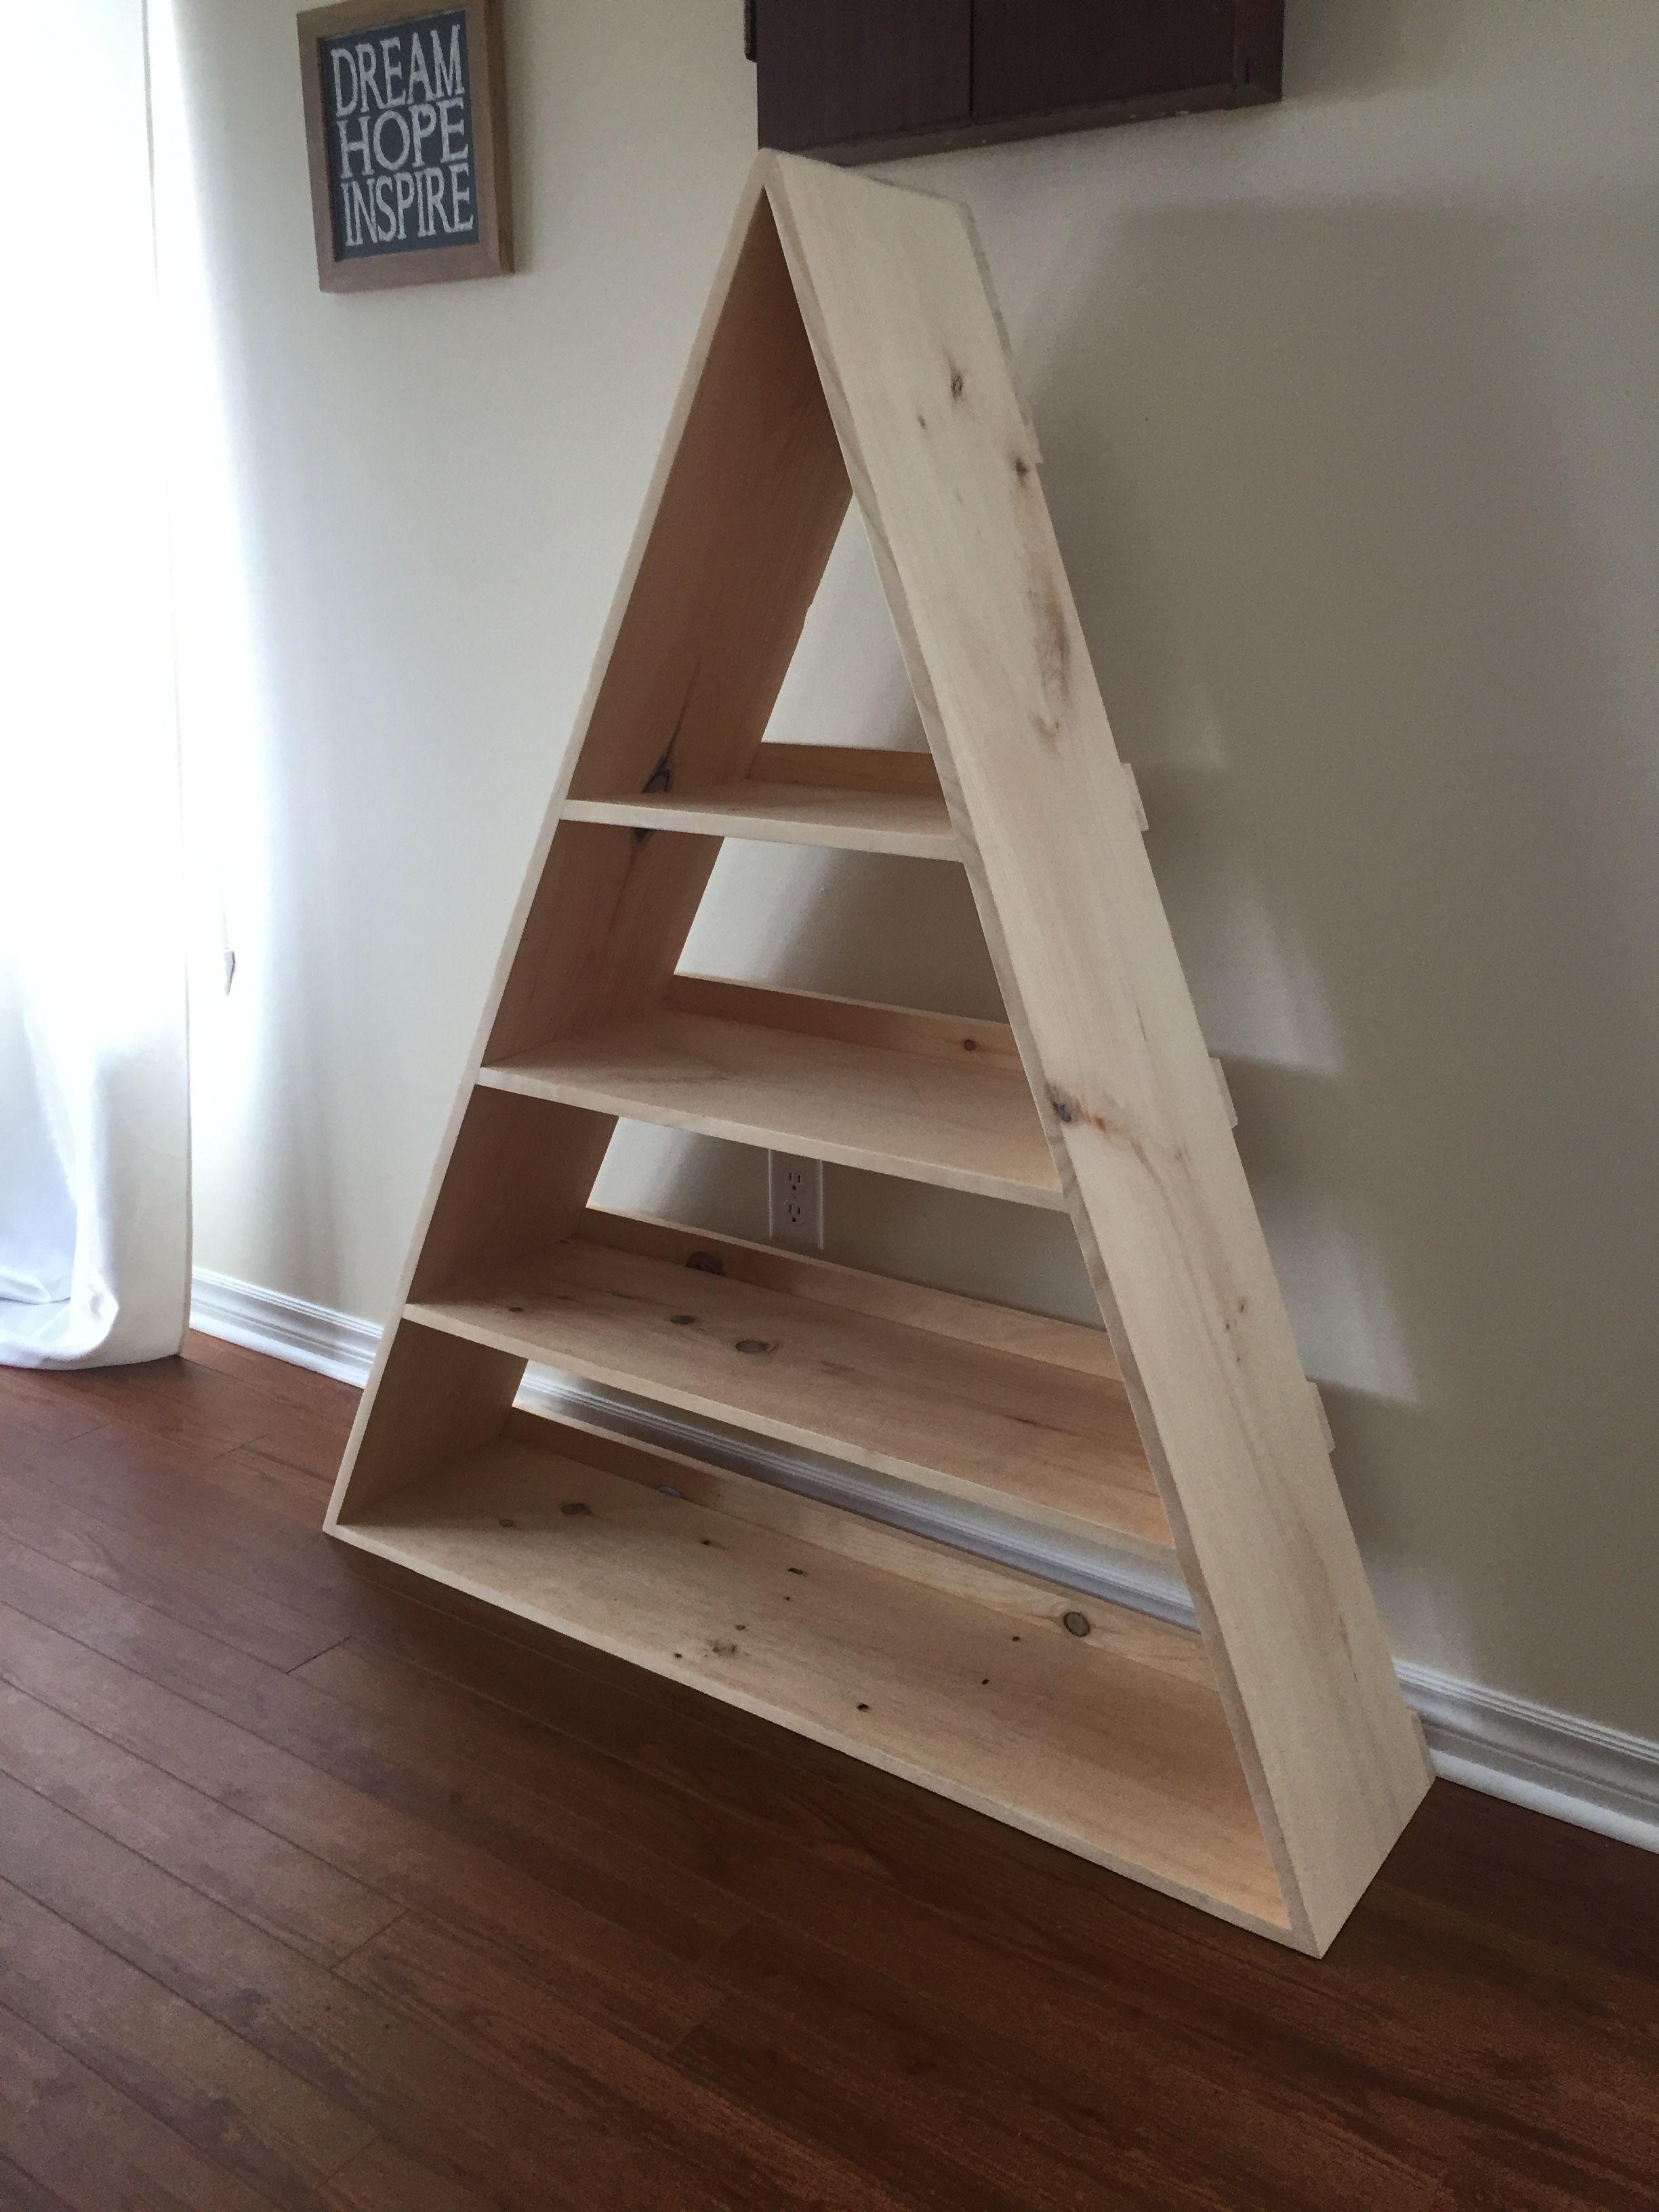 Triangle Book Shelf So Beautiful Bookshelf Decor Room Redo